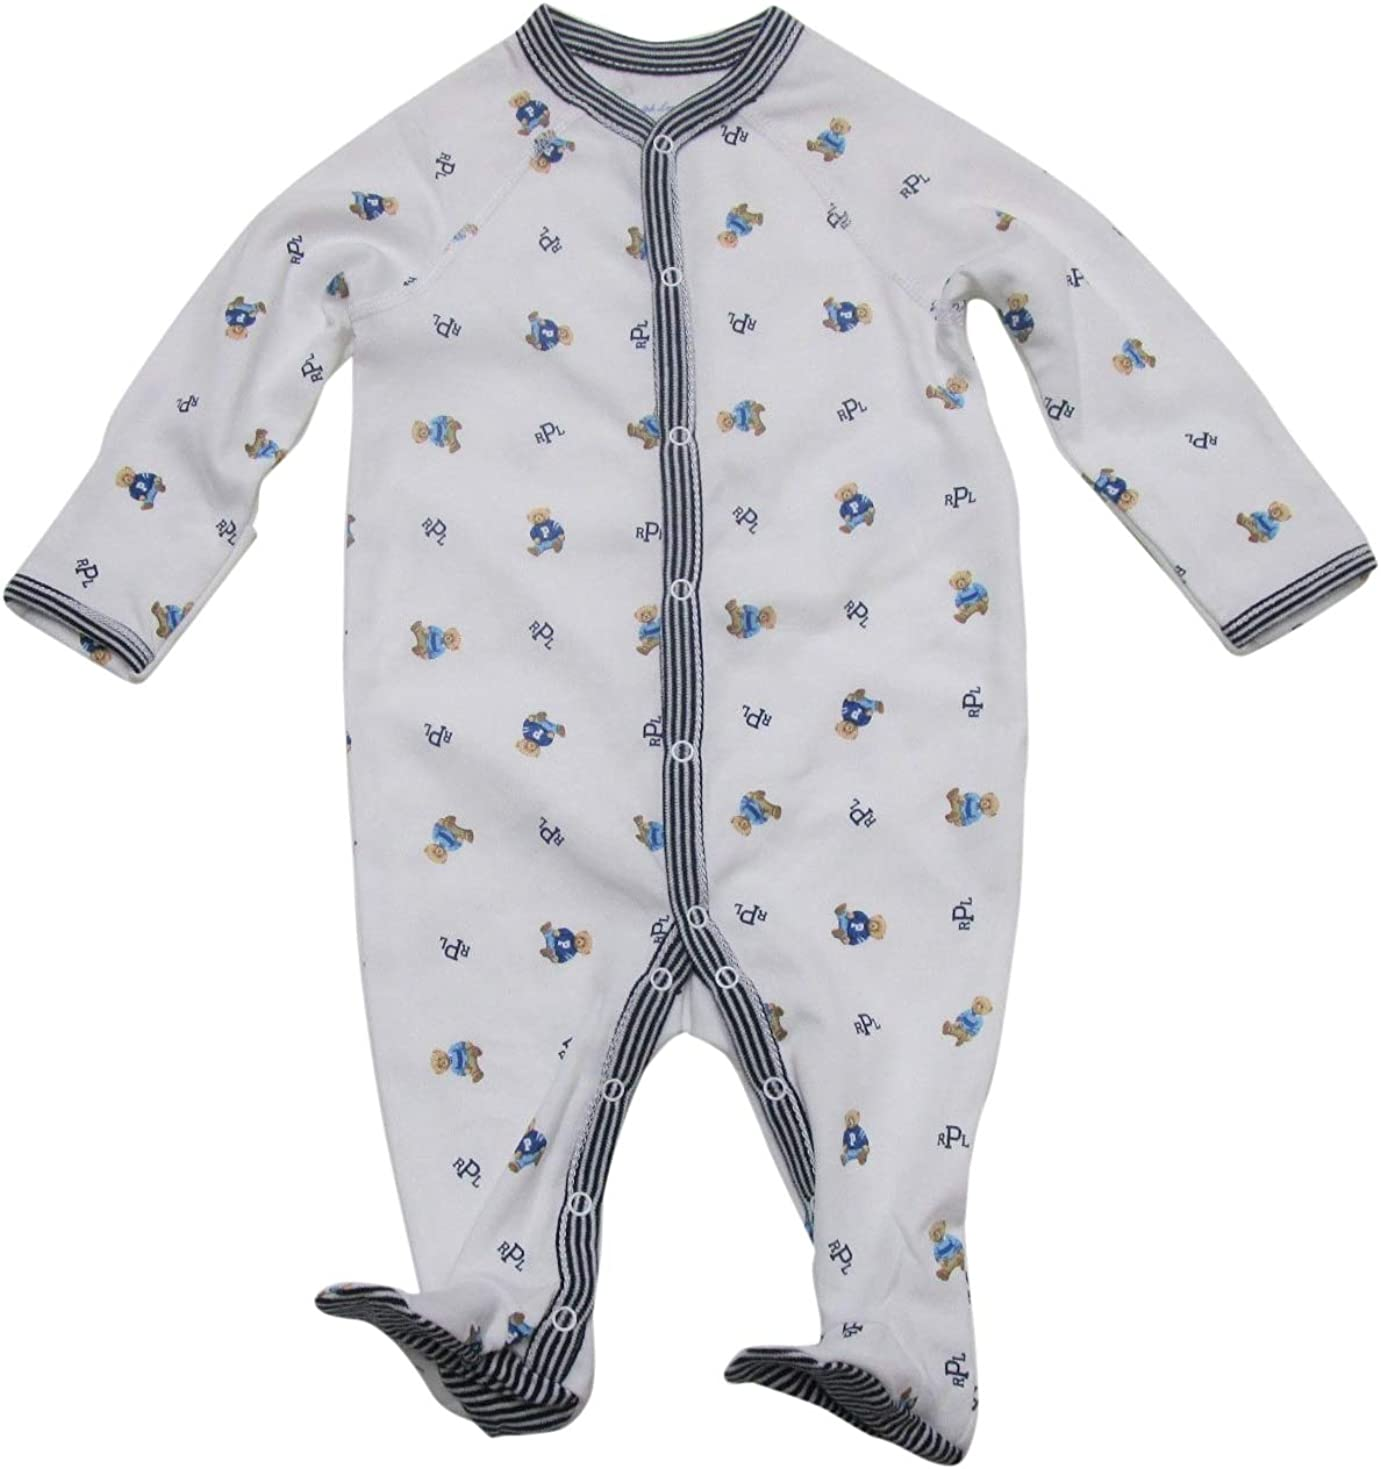 Polo Ralph Lauren Kids Baby Boy's Printed Interlock Bear Coveralls (Infant)